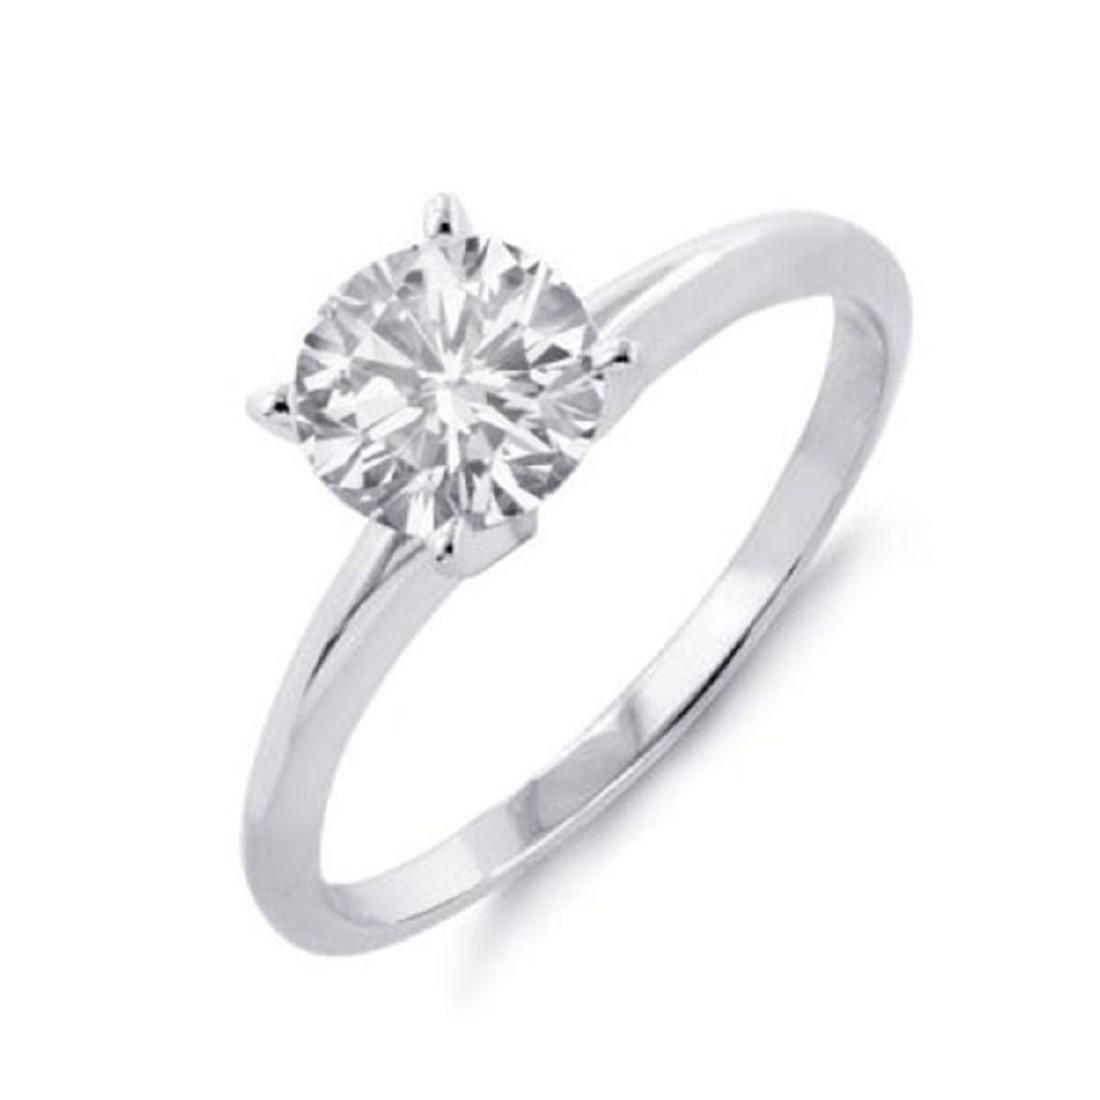 0.50 ctw VS/SI Diamond Solitaire Ring 18K White Gold -